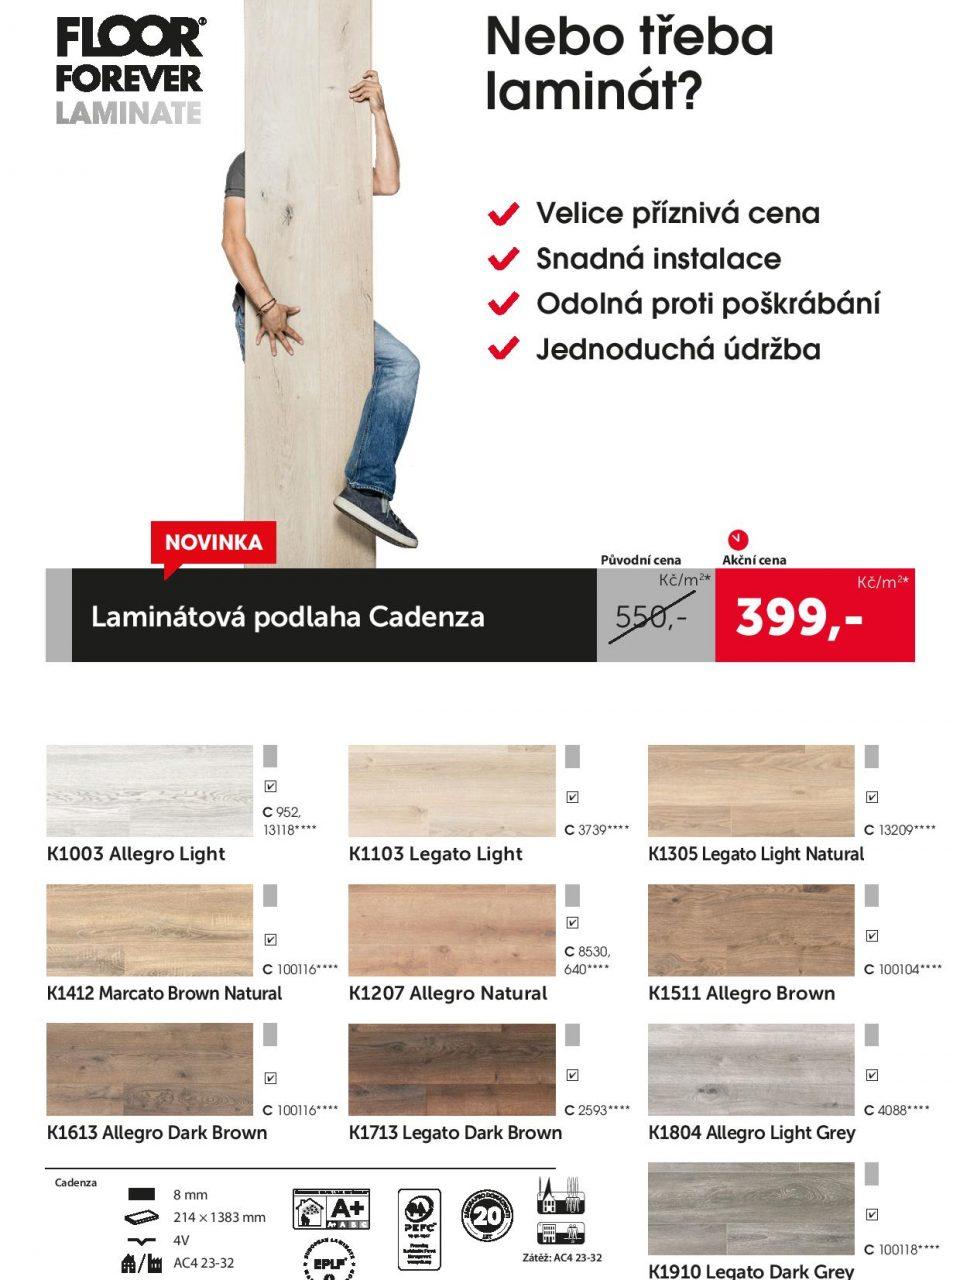 FF-vinyl-letak-promo-8xA4-2021-02-online-page-007